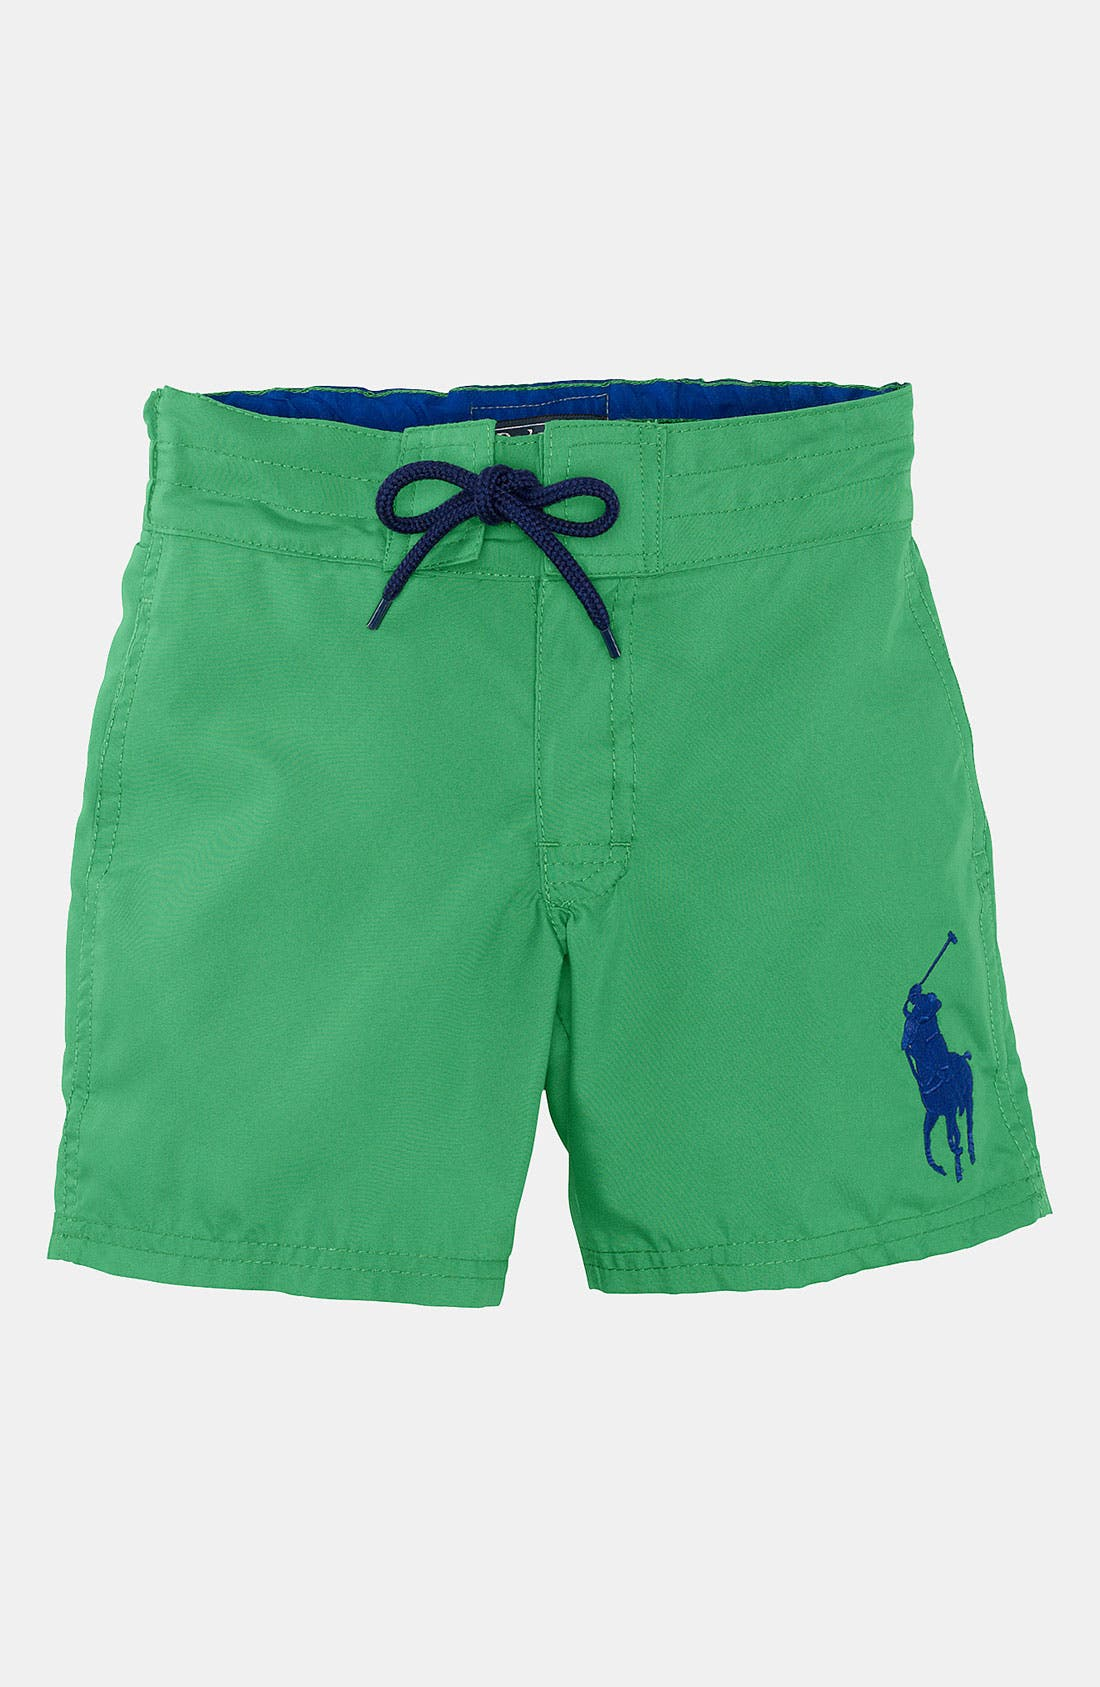 Main Image - Ralph Lauren Swim Trunks (Toddler)